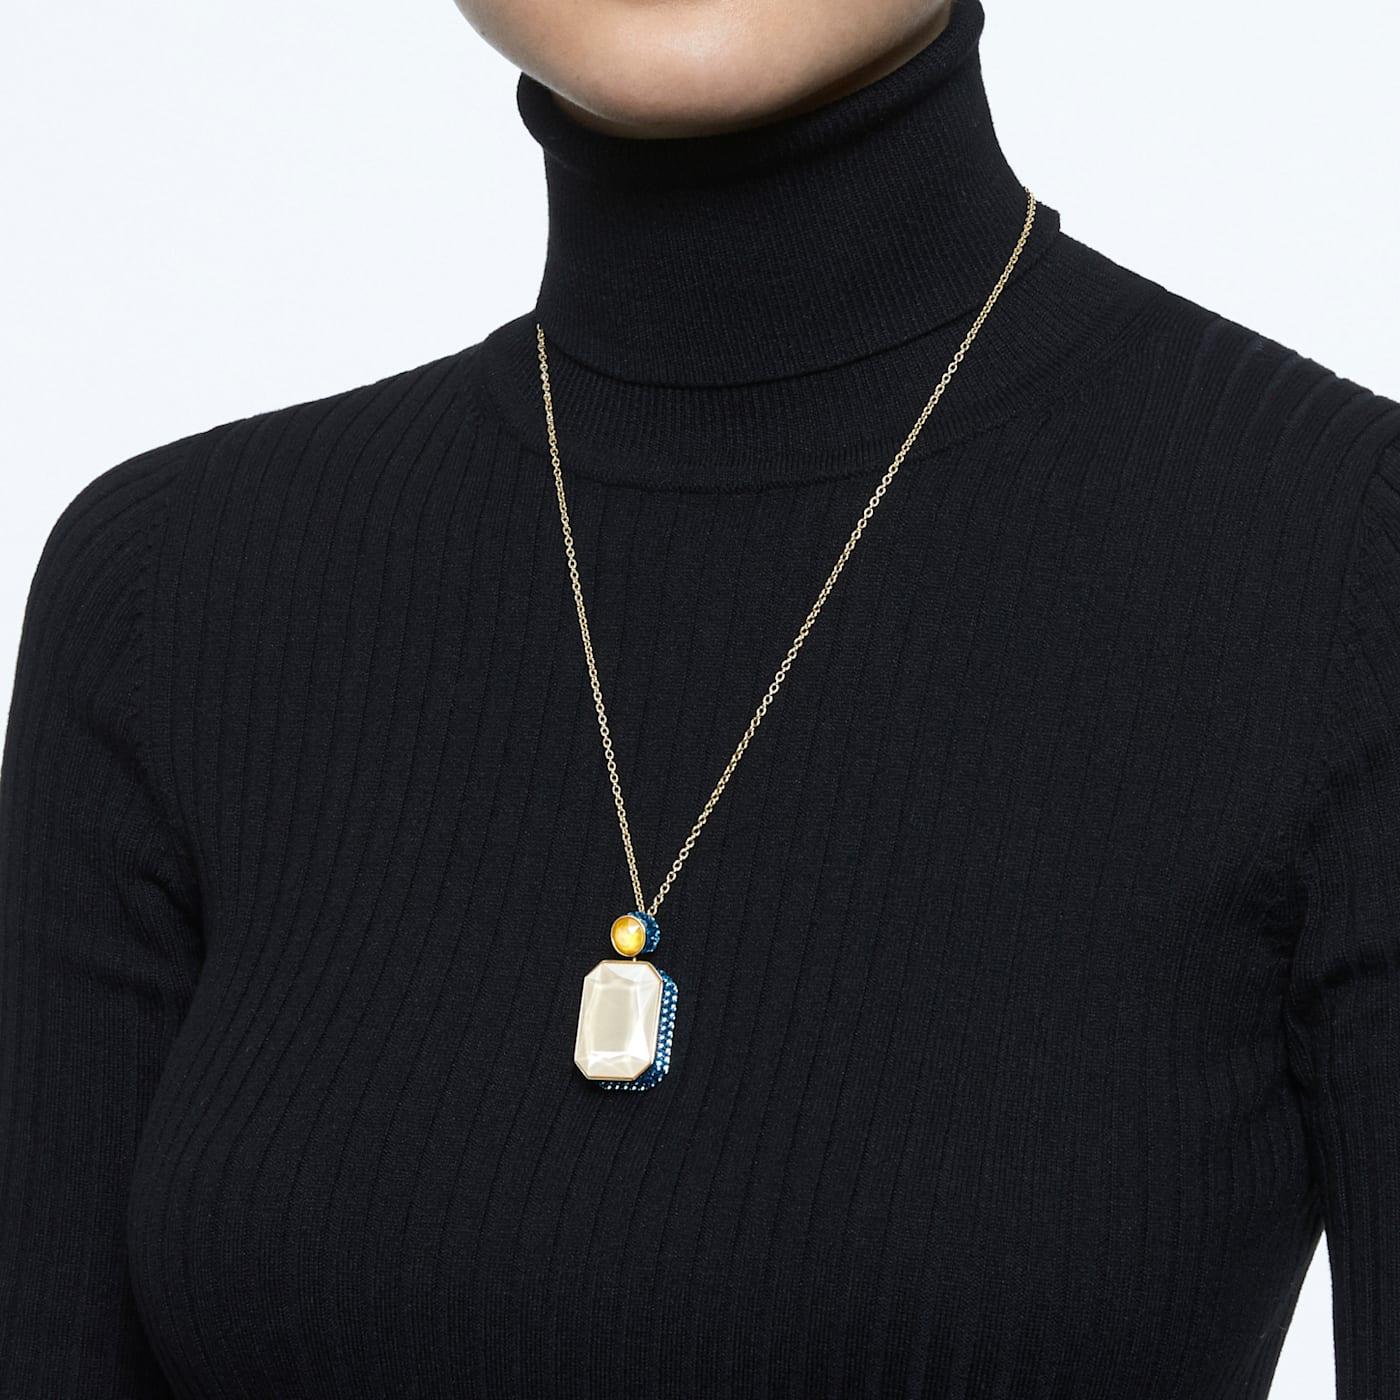 Collier Orbita Cristal taille octogone, Multicolore, Métal doré, Swarovski